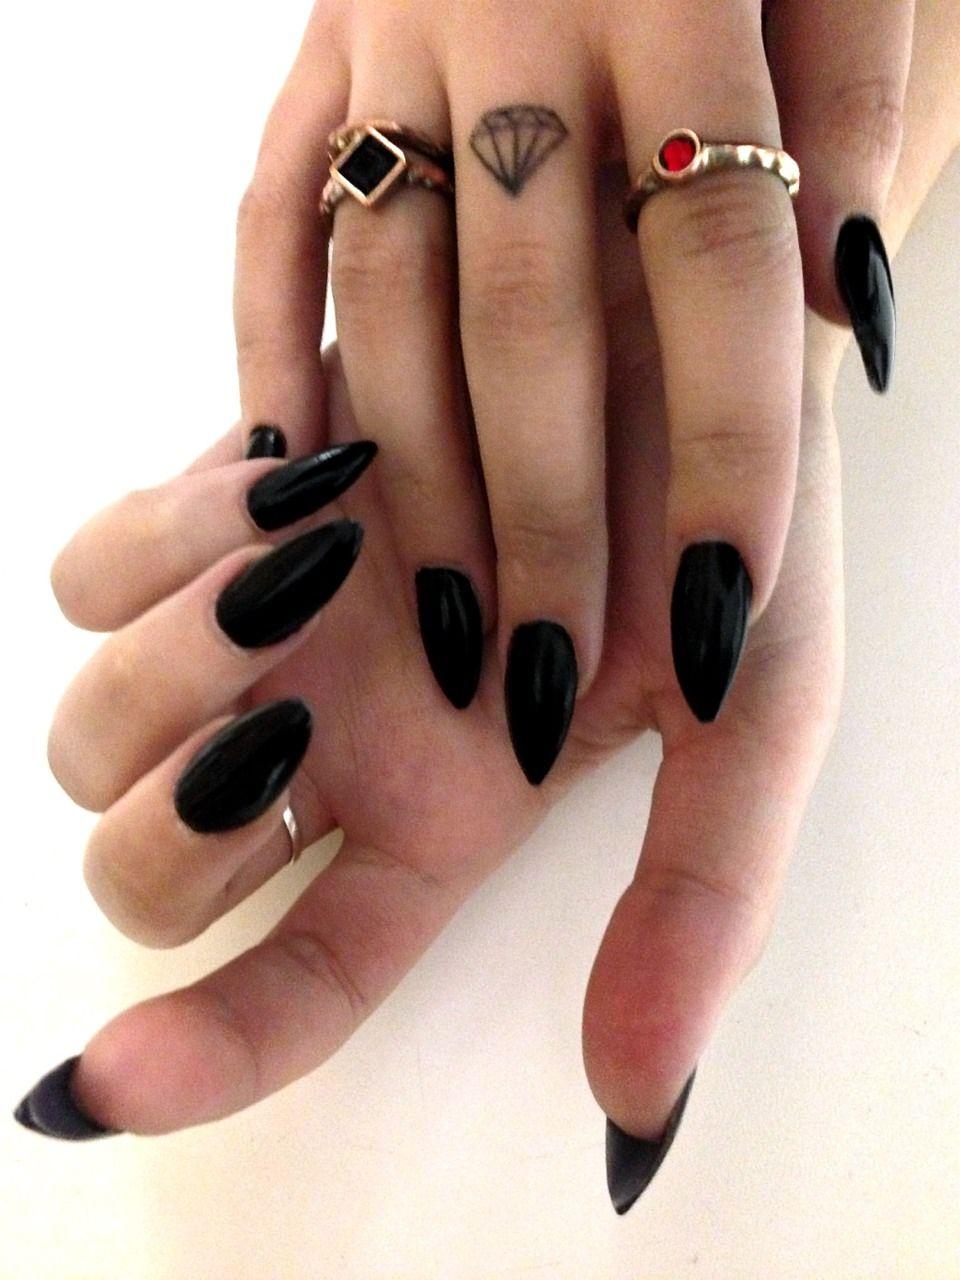 Louboutin Inspired Nails Black Gel Nails Black Acrylic Nails Trendy Nails